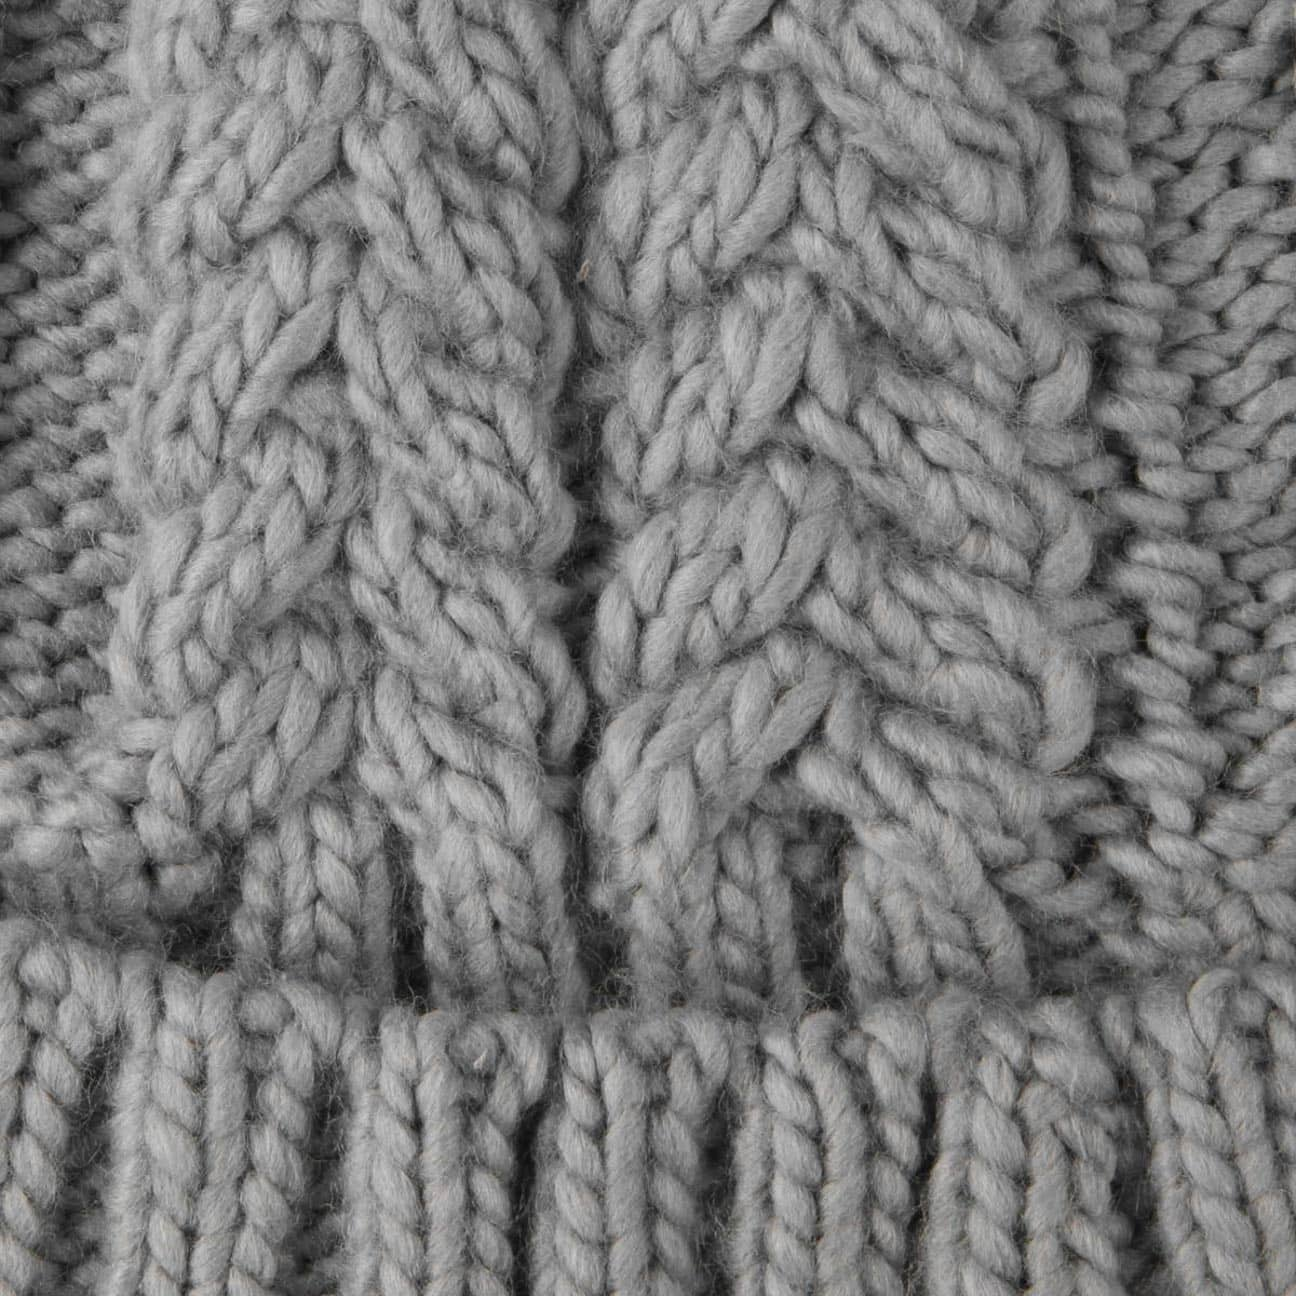 kaycee pompom hat by neff eur 34 90 hats caps beanies shop online. Black Bedroom Furniture Sets. Home Design Ideas